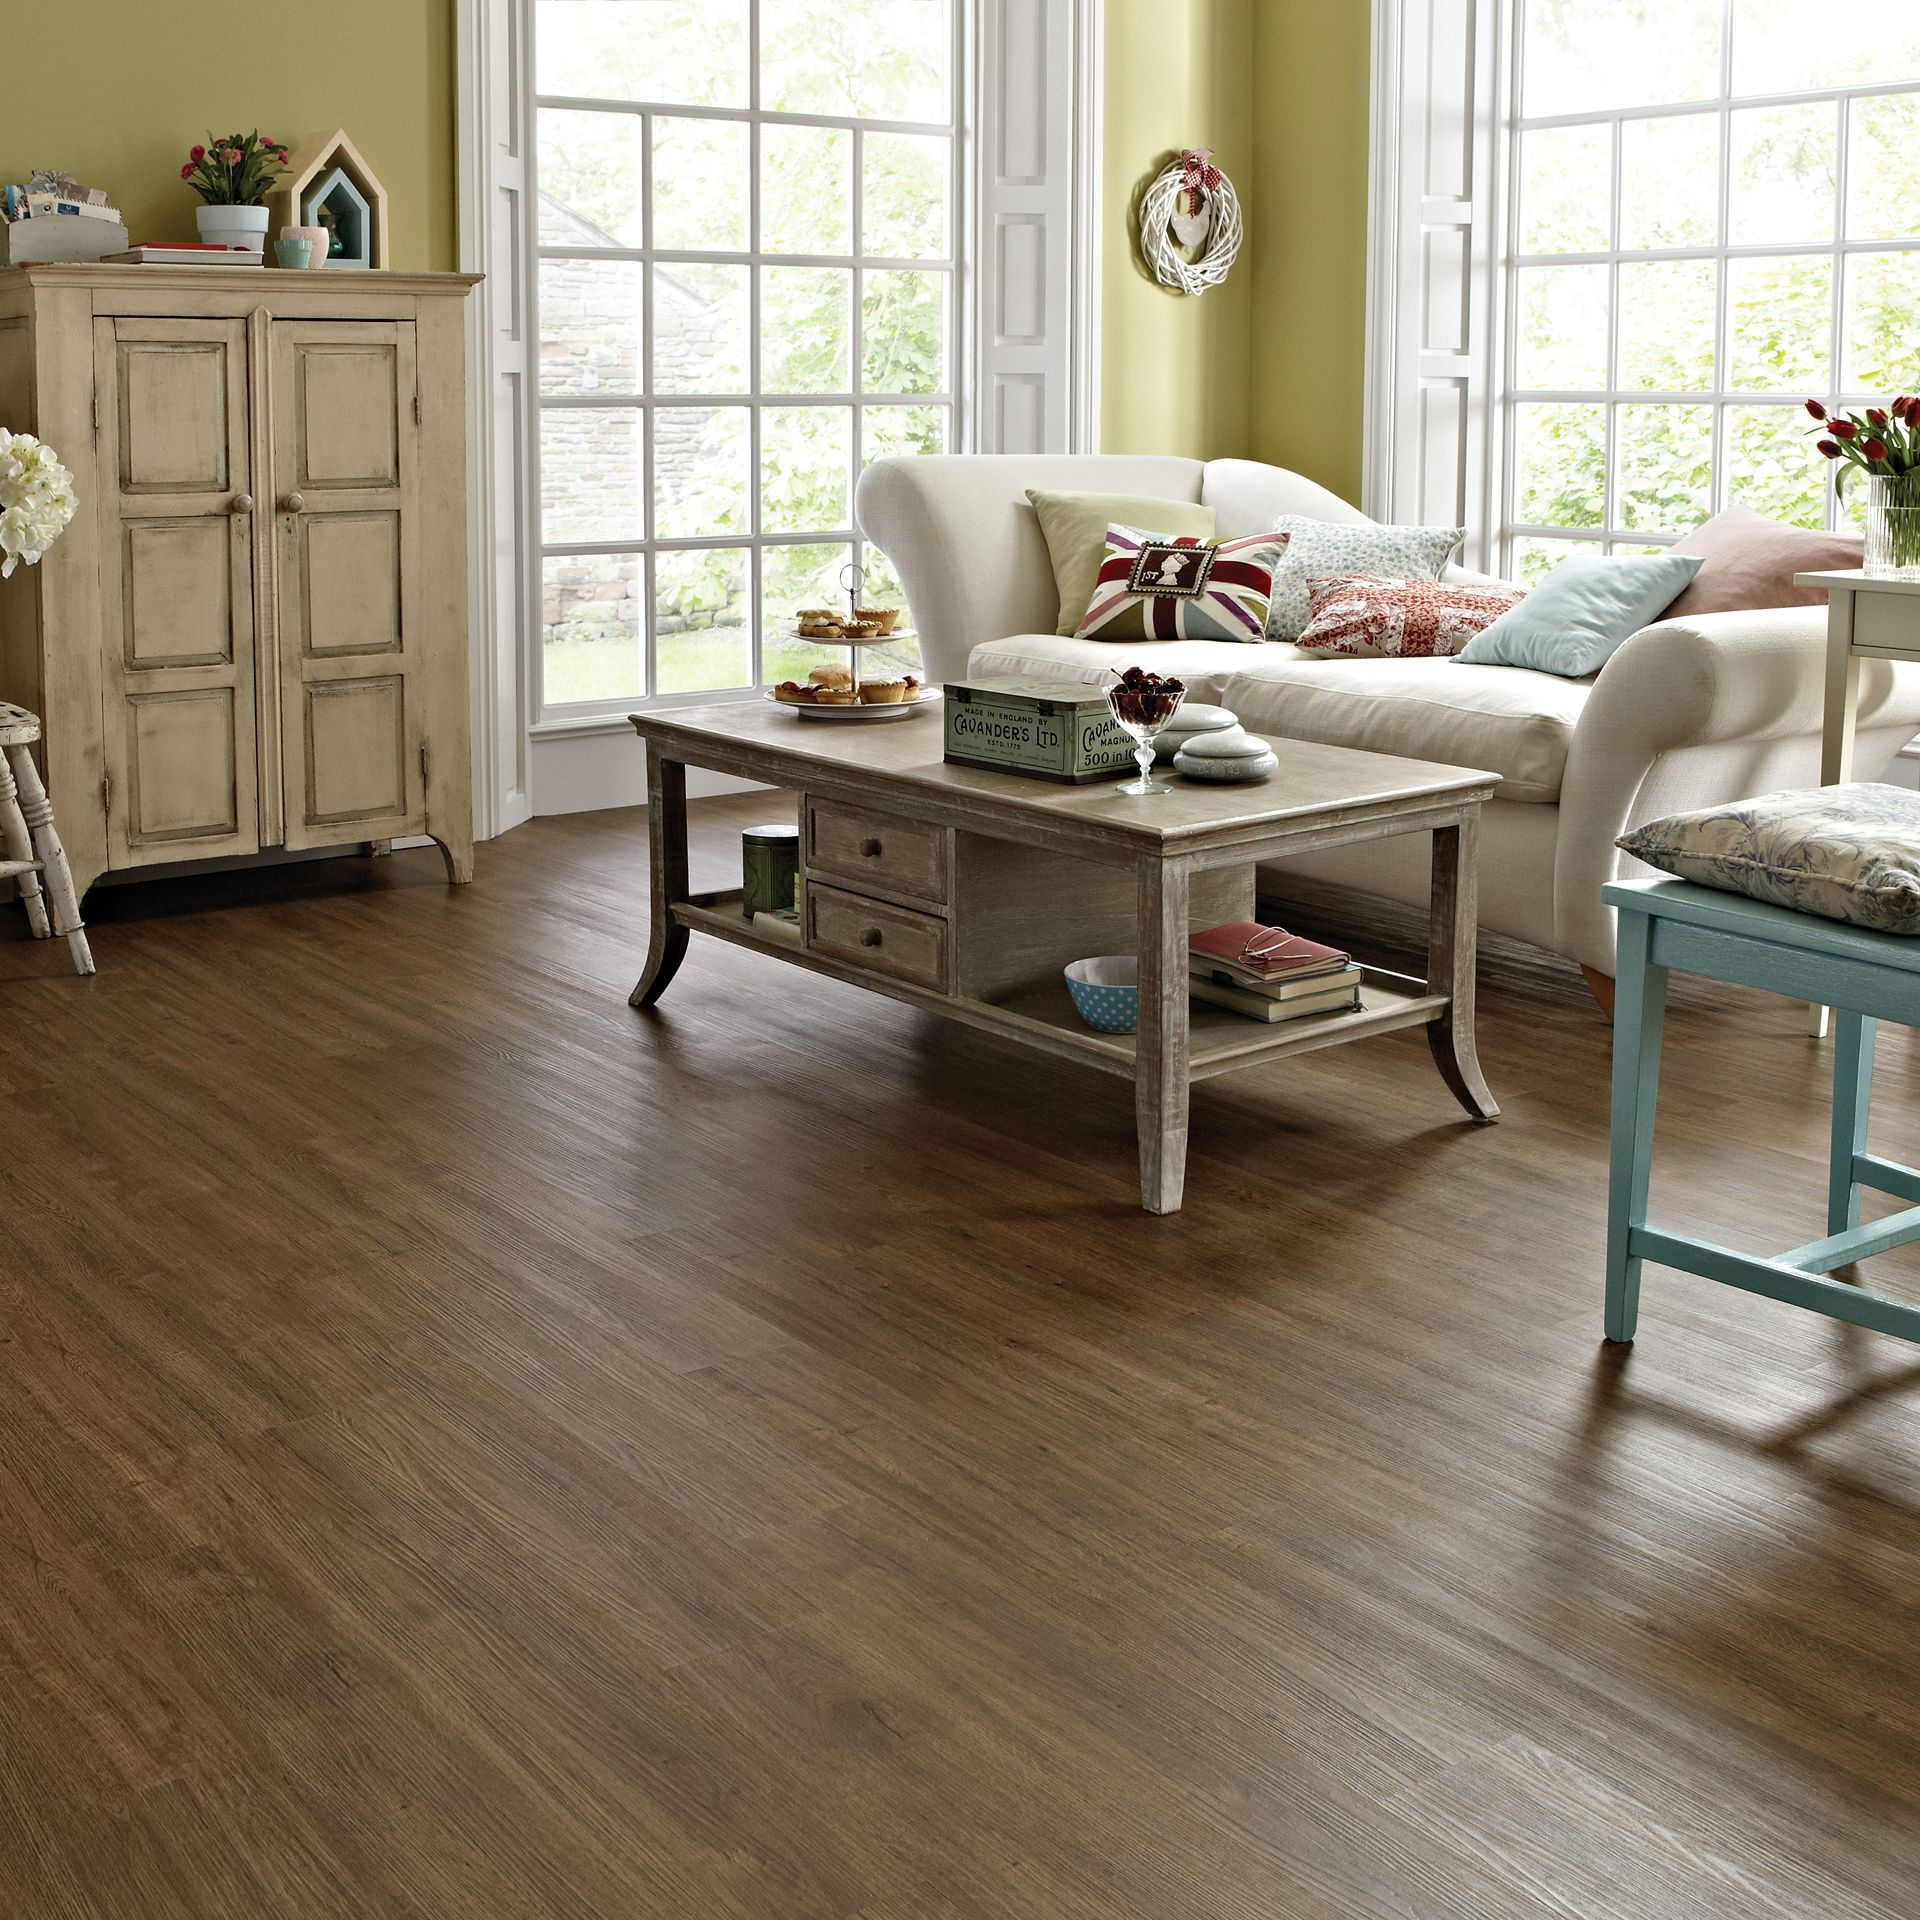 Natural Wood Effect Flooring Tiles And Planks Mid Brushed Oak